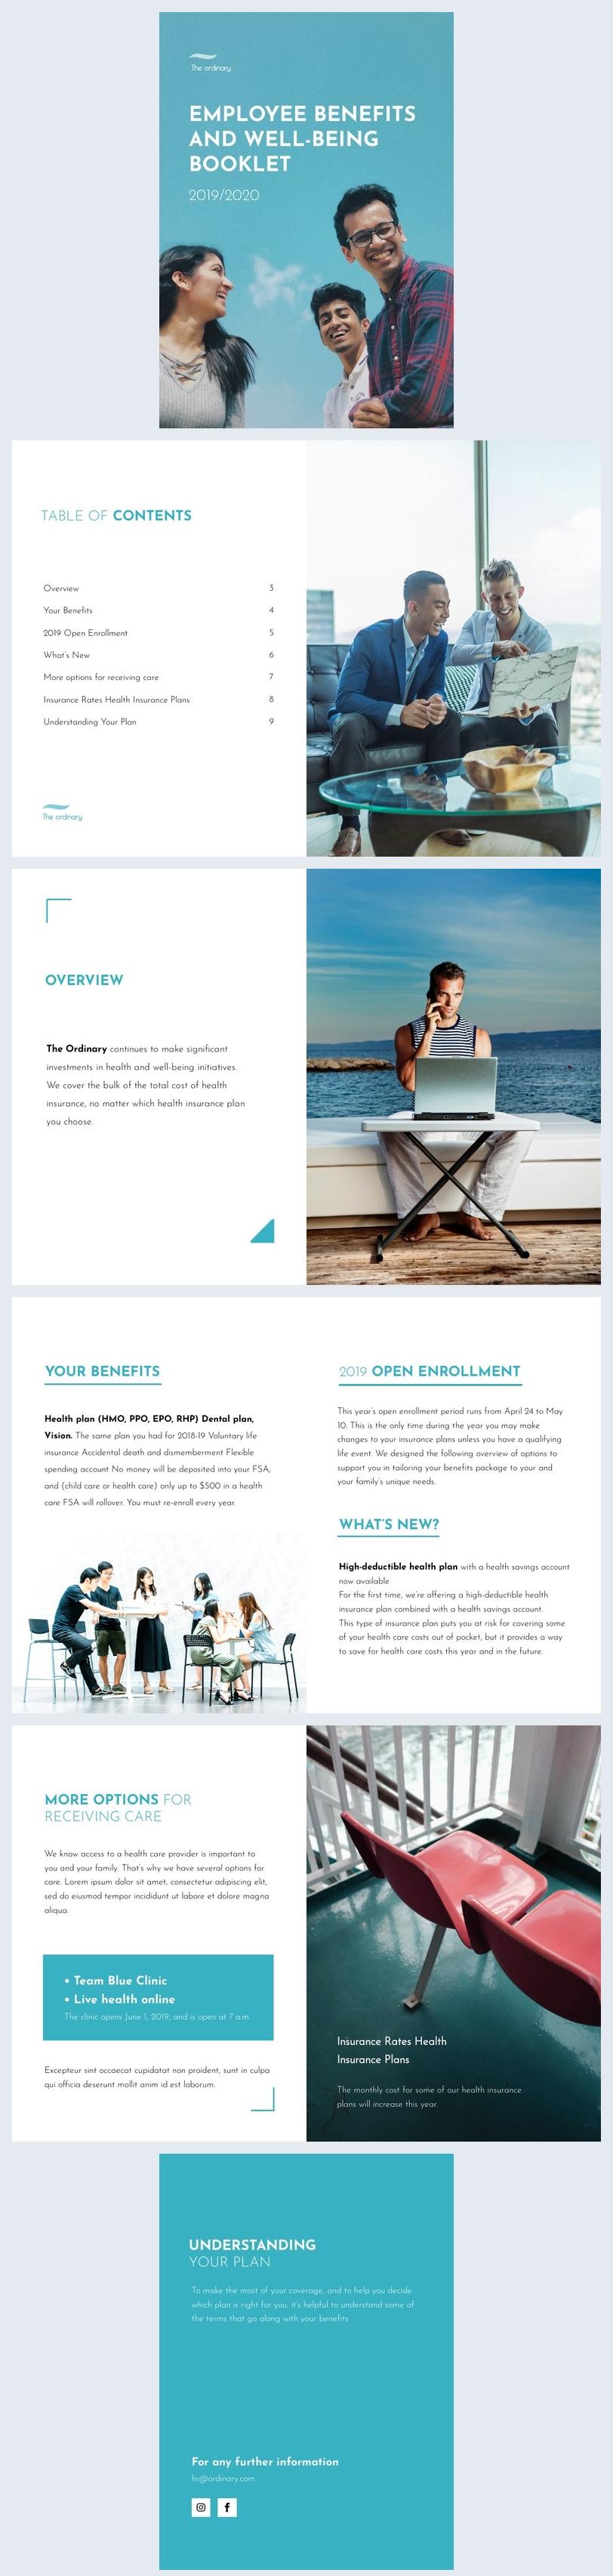 Employee Benefits Booklet Template Design